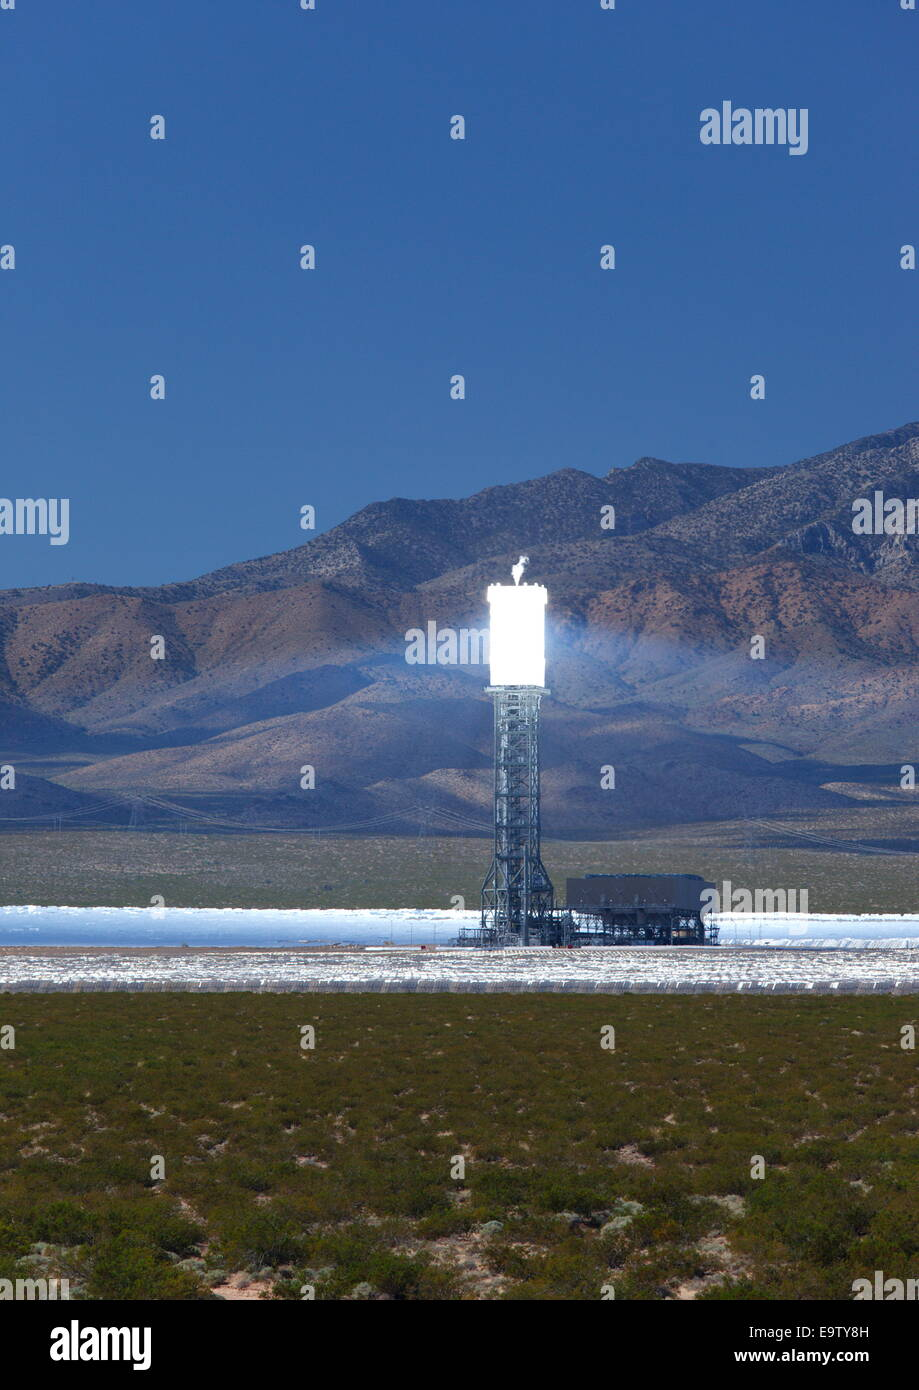 Proyecto de energía térmica solar Ivanpah, cerca de Primm, California, EE.UU. Imagen De Stock